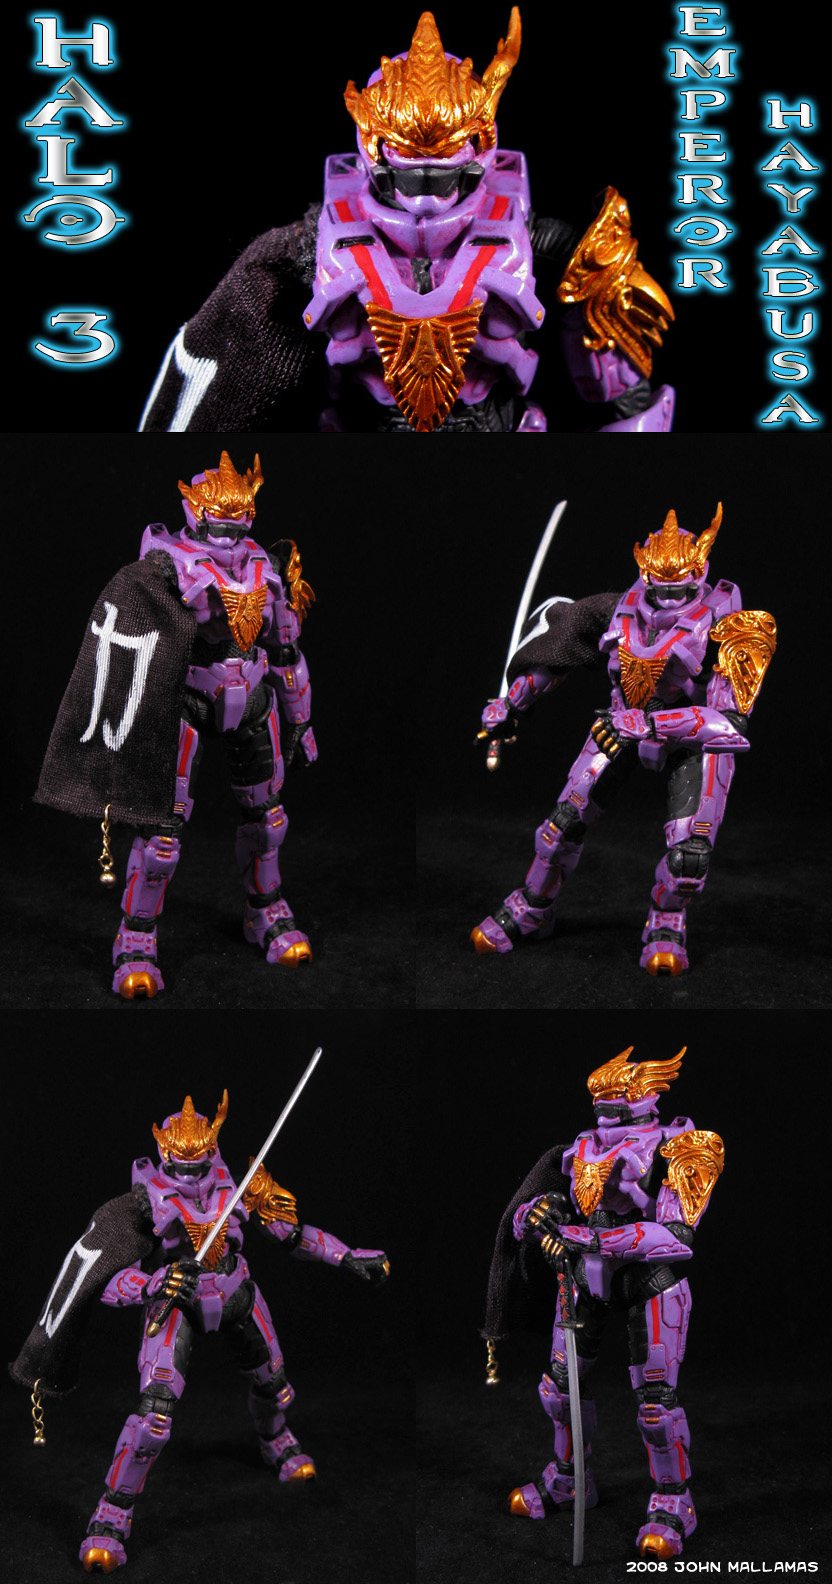 Halo 3 Emperor Hayabusa Figure